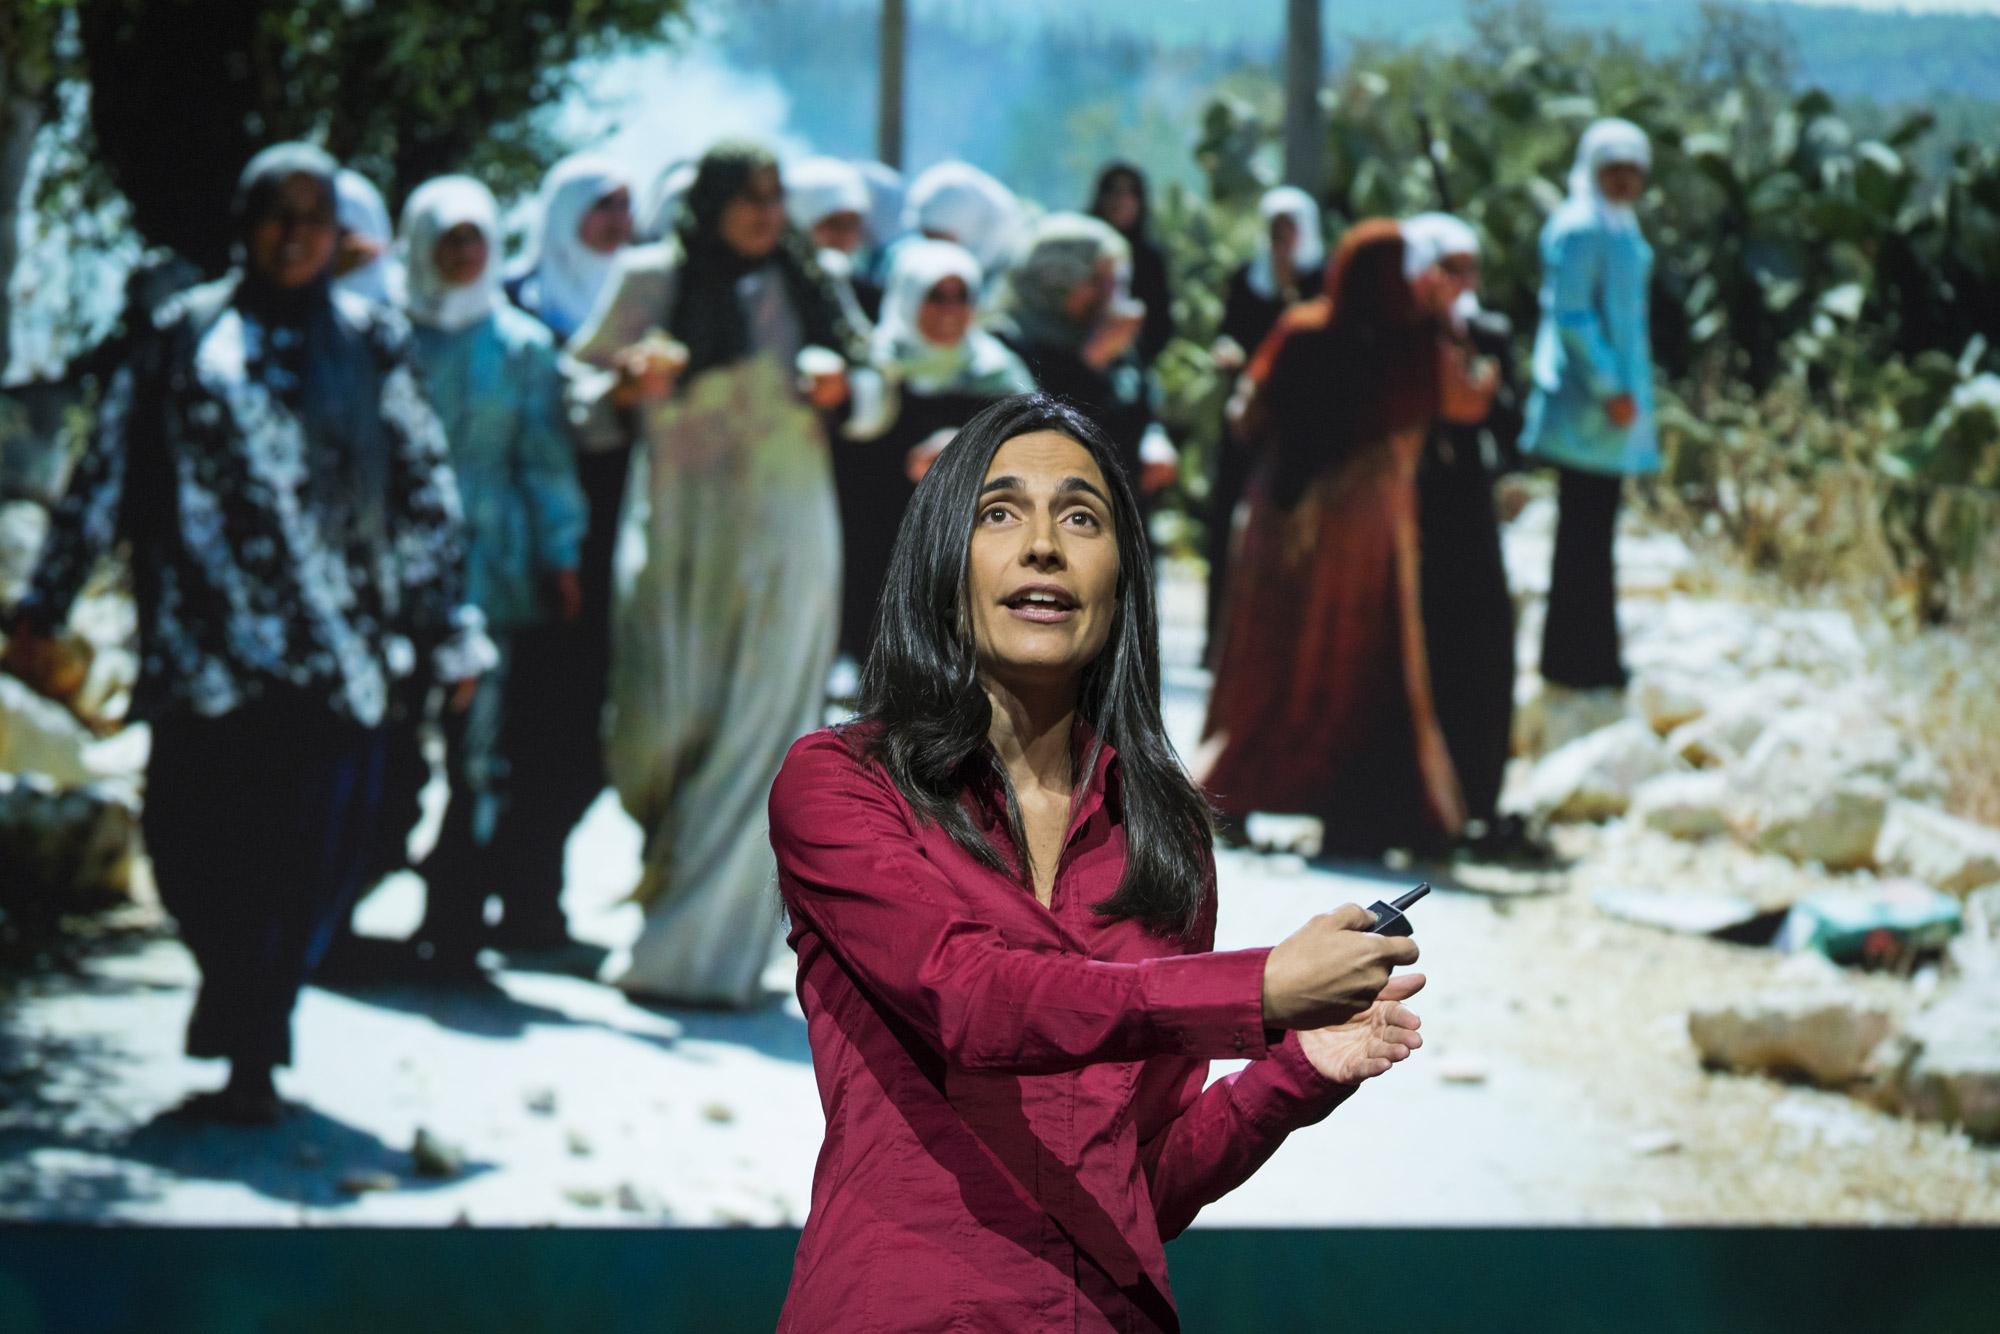 Filmmaker Julia Bacha explores the hidden role of women in modern conflict. Photo: Bret Hartman